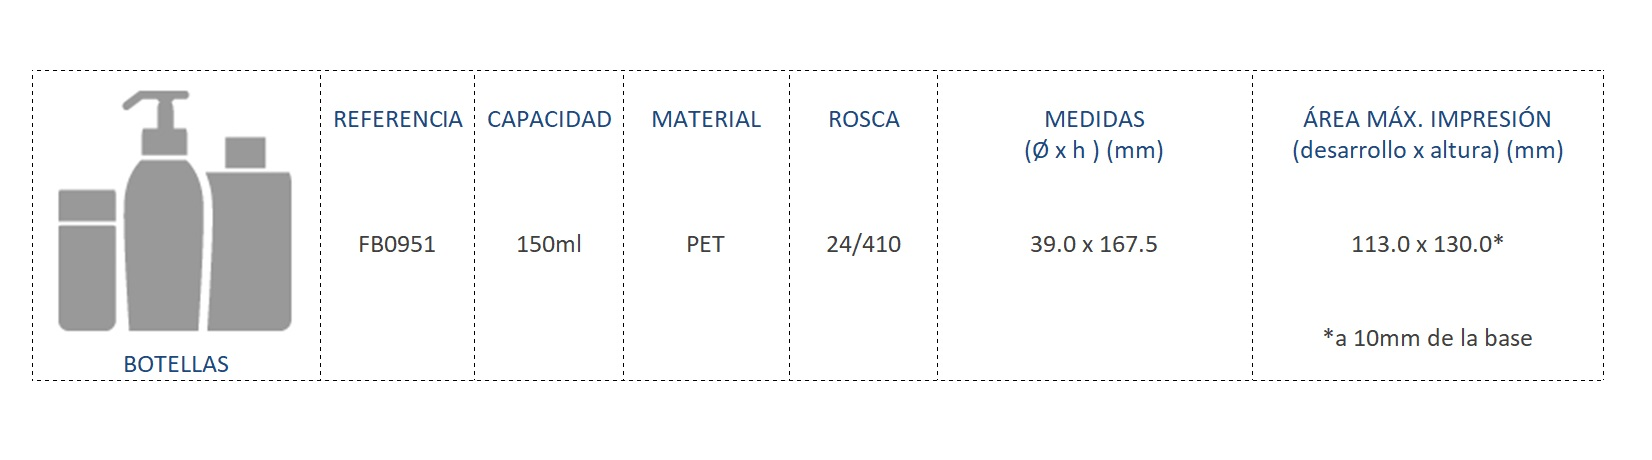 Cuadro de materiales botella FB0951